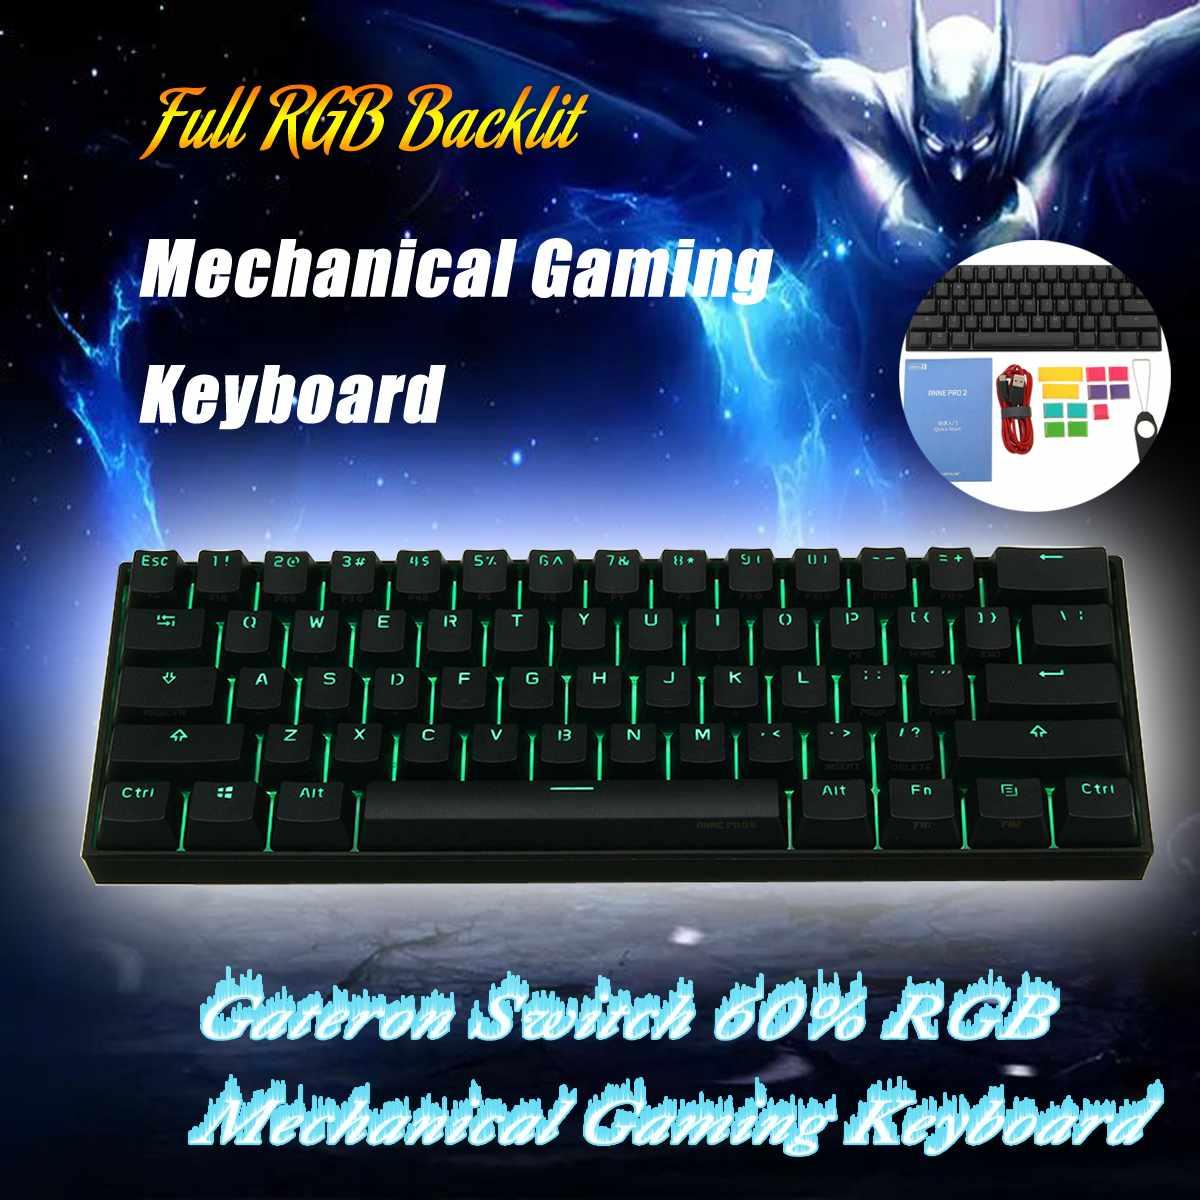 Gateron Switch Obins Anne NKRO bluetooth 4.0 Type-C RGB Mechanical Gaming Keyboard Computer PeripheralsGateron Switch Obins Anne NKRO bluetooth 4.0 Type-C RGB Mechanical Gaming Keyboard Computer Peripherals